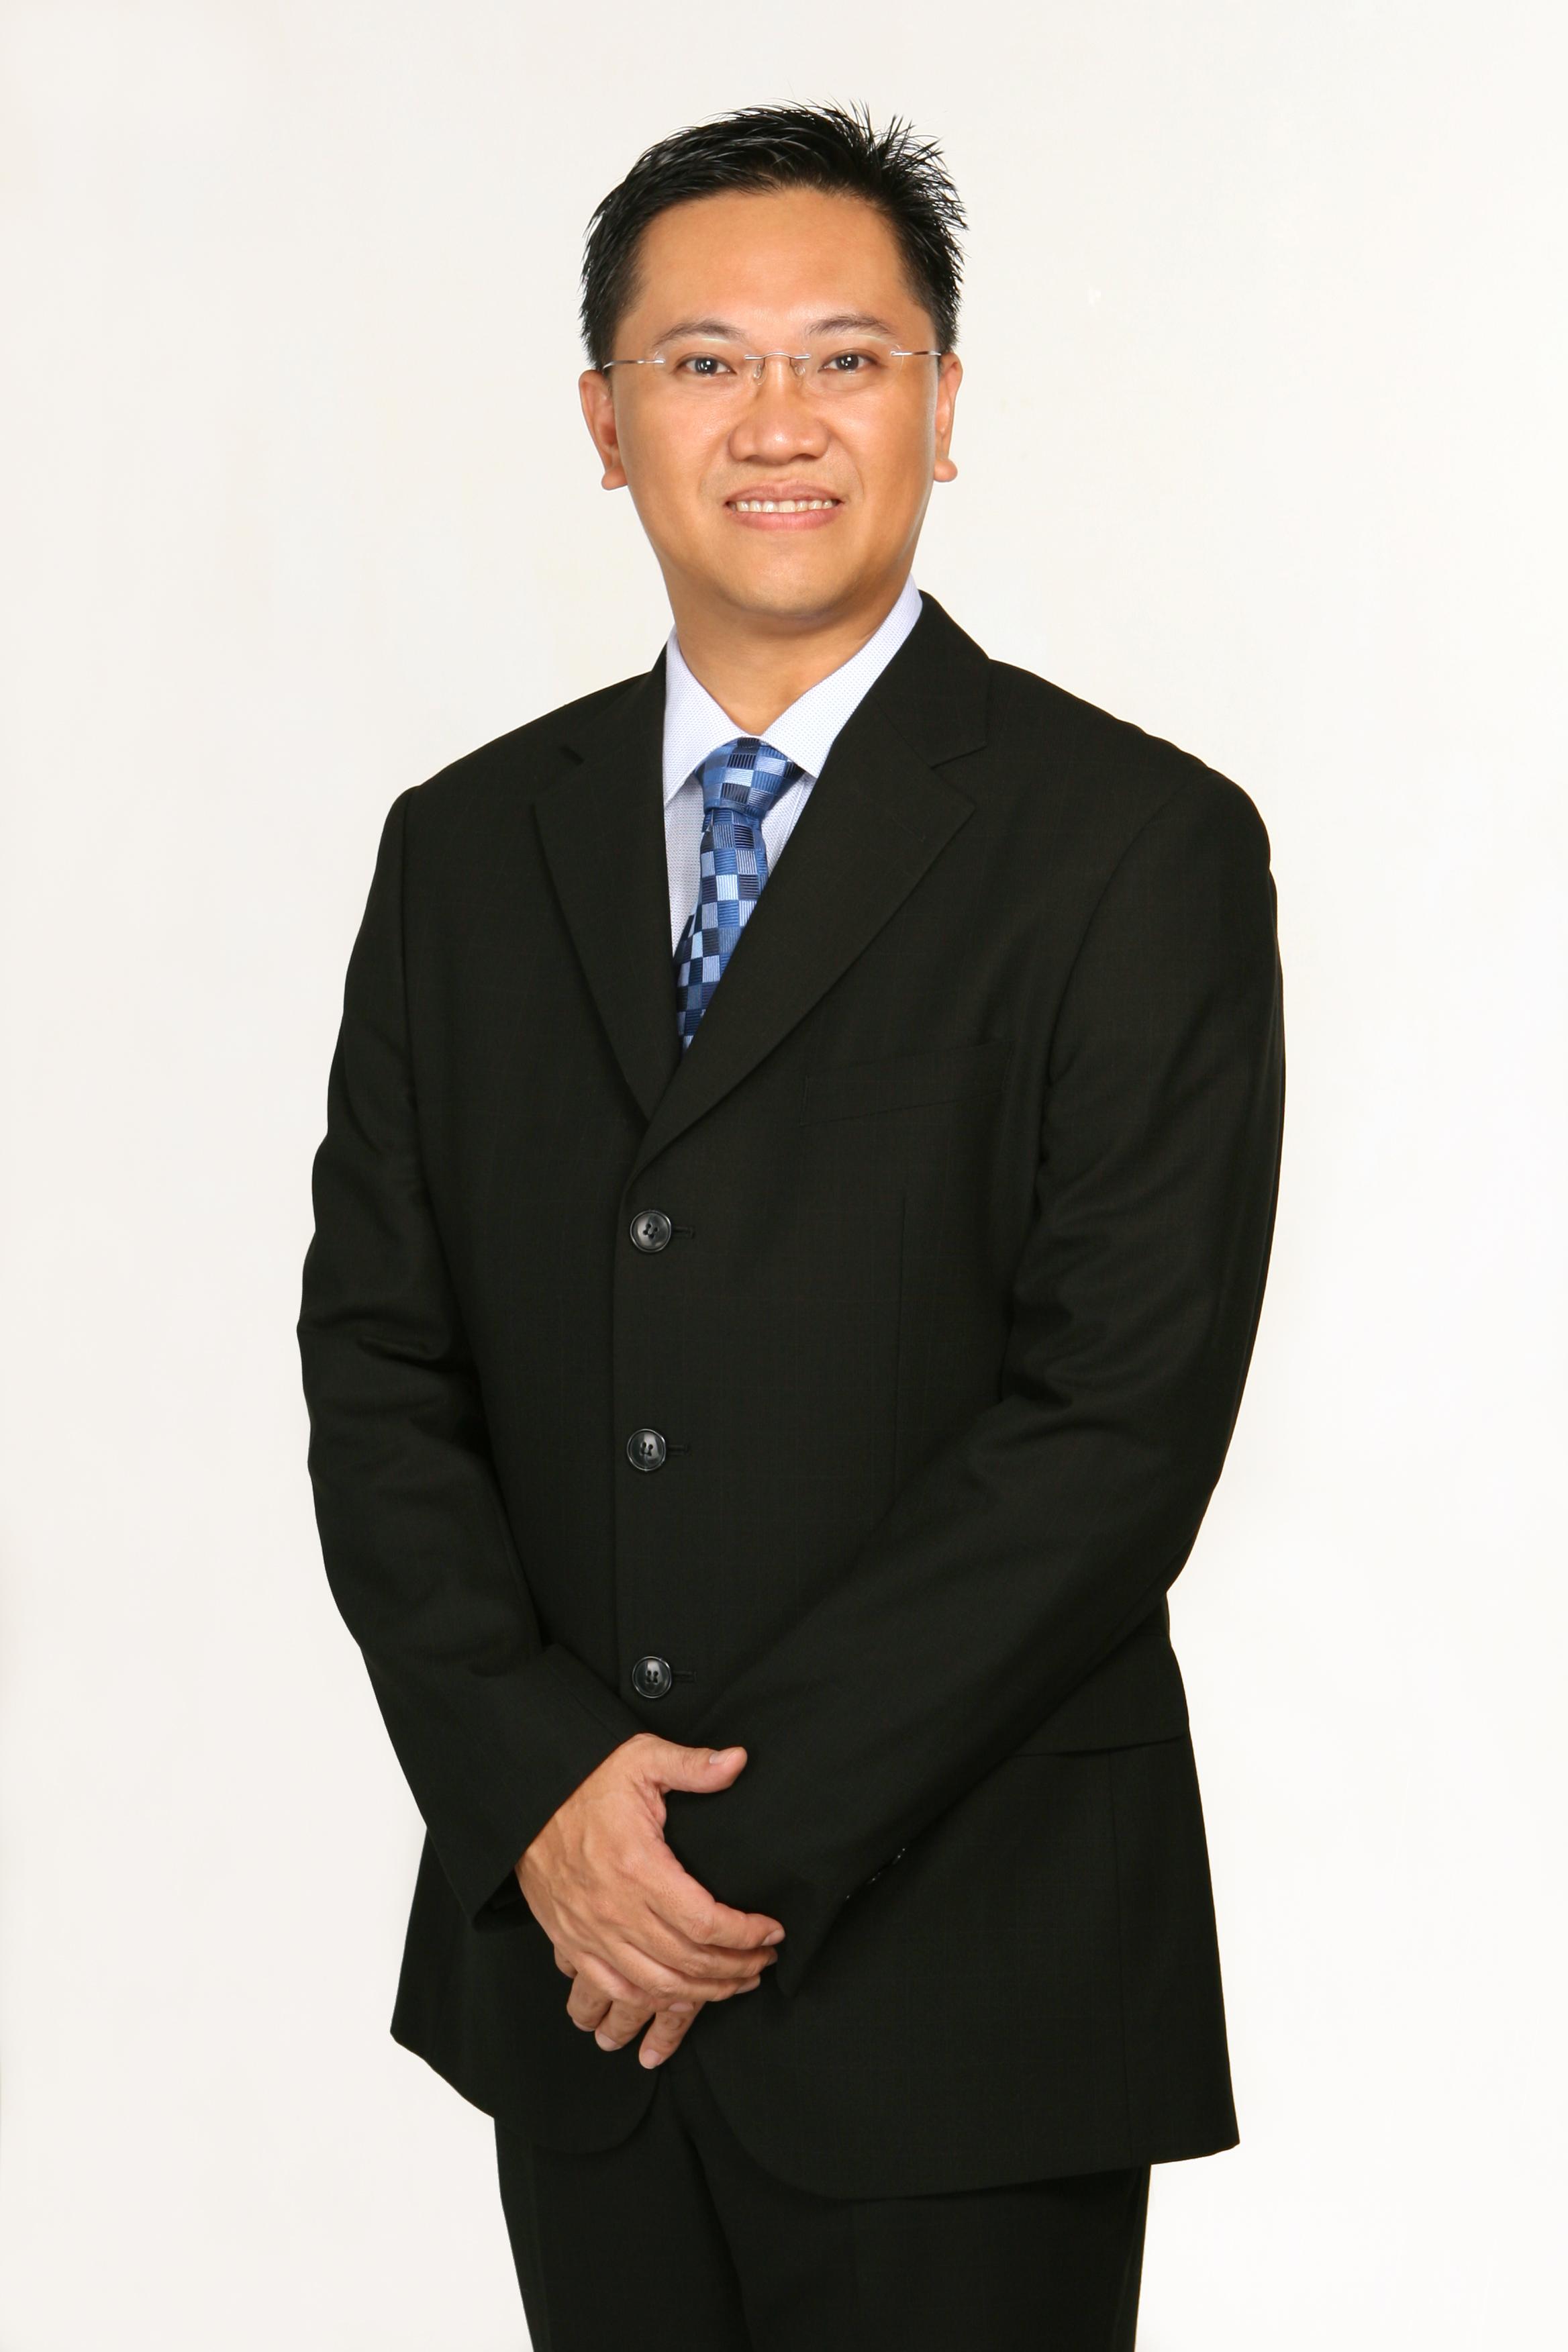 Wong Hong Executive Headshot